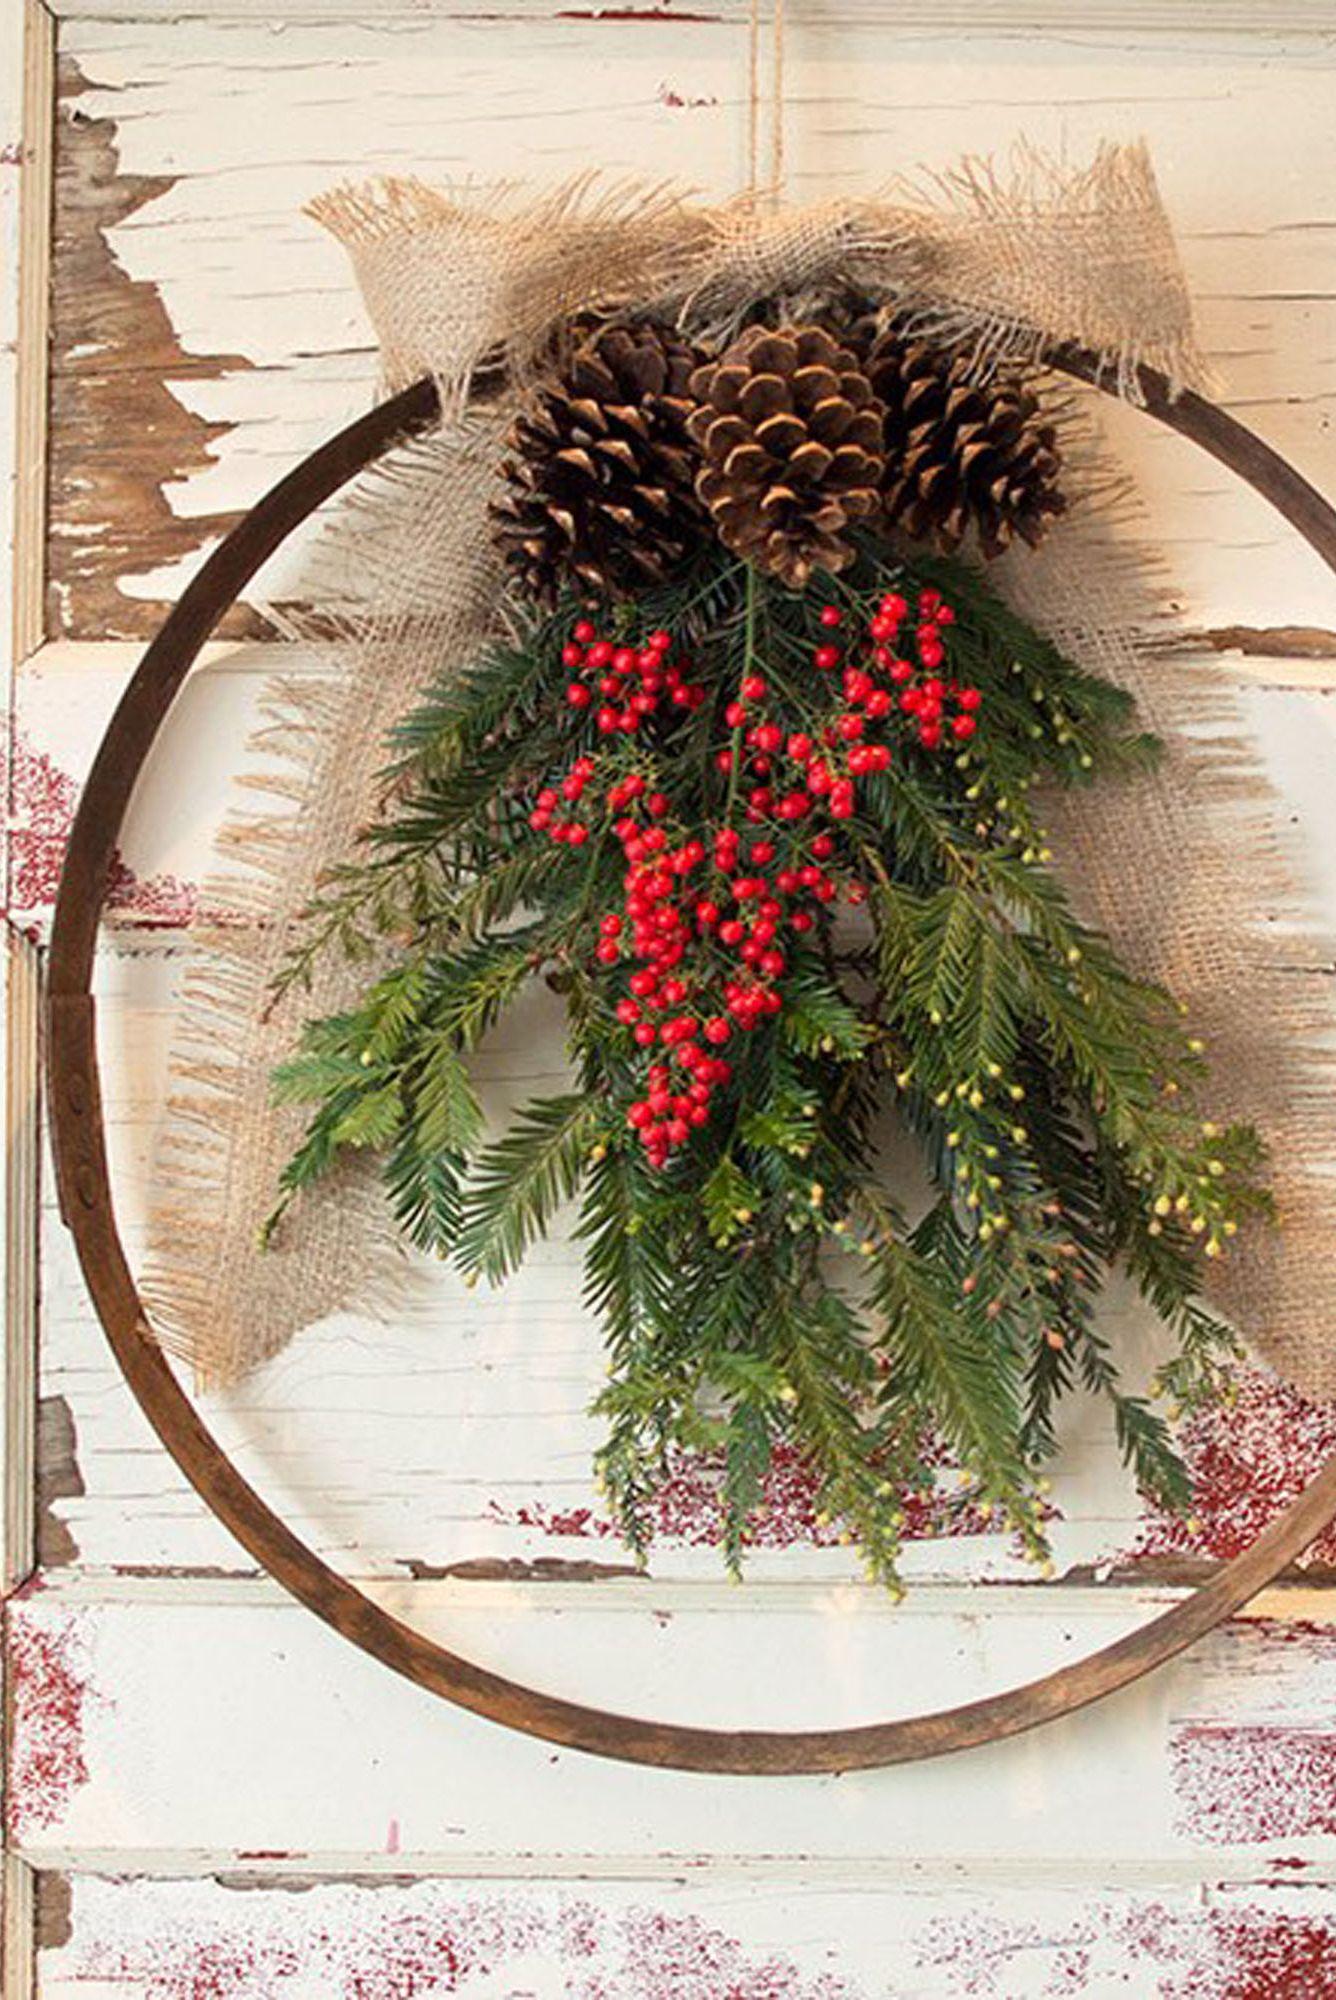 67 Diy Christmas Wreath Ideas How To Make Holiday